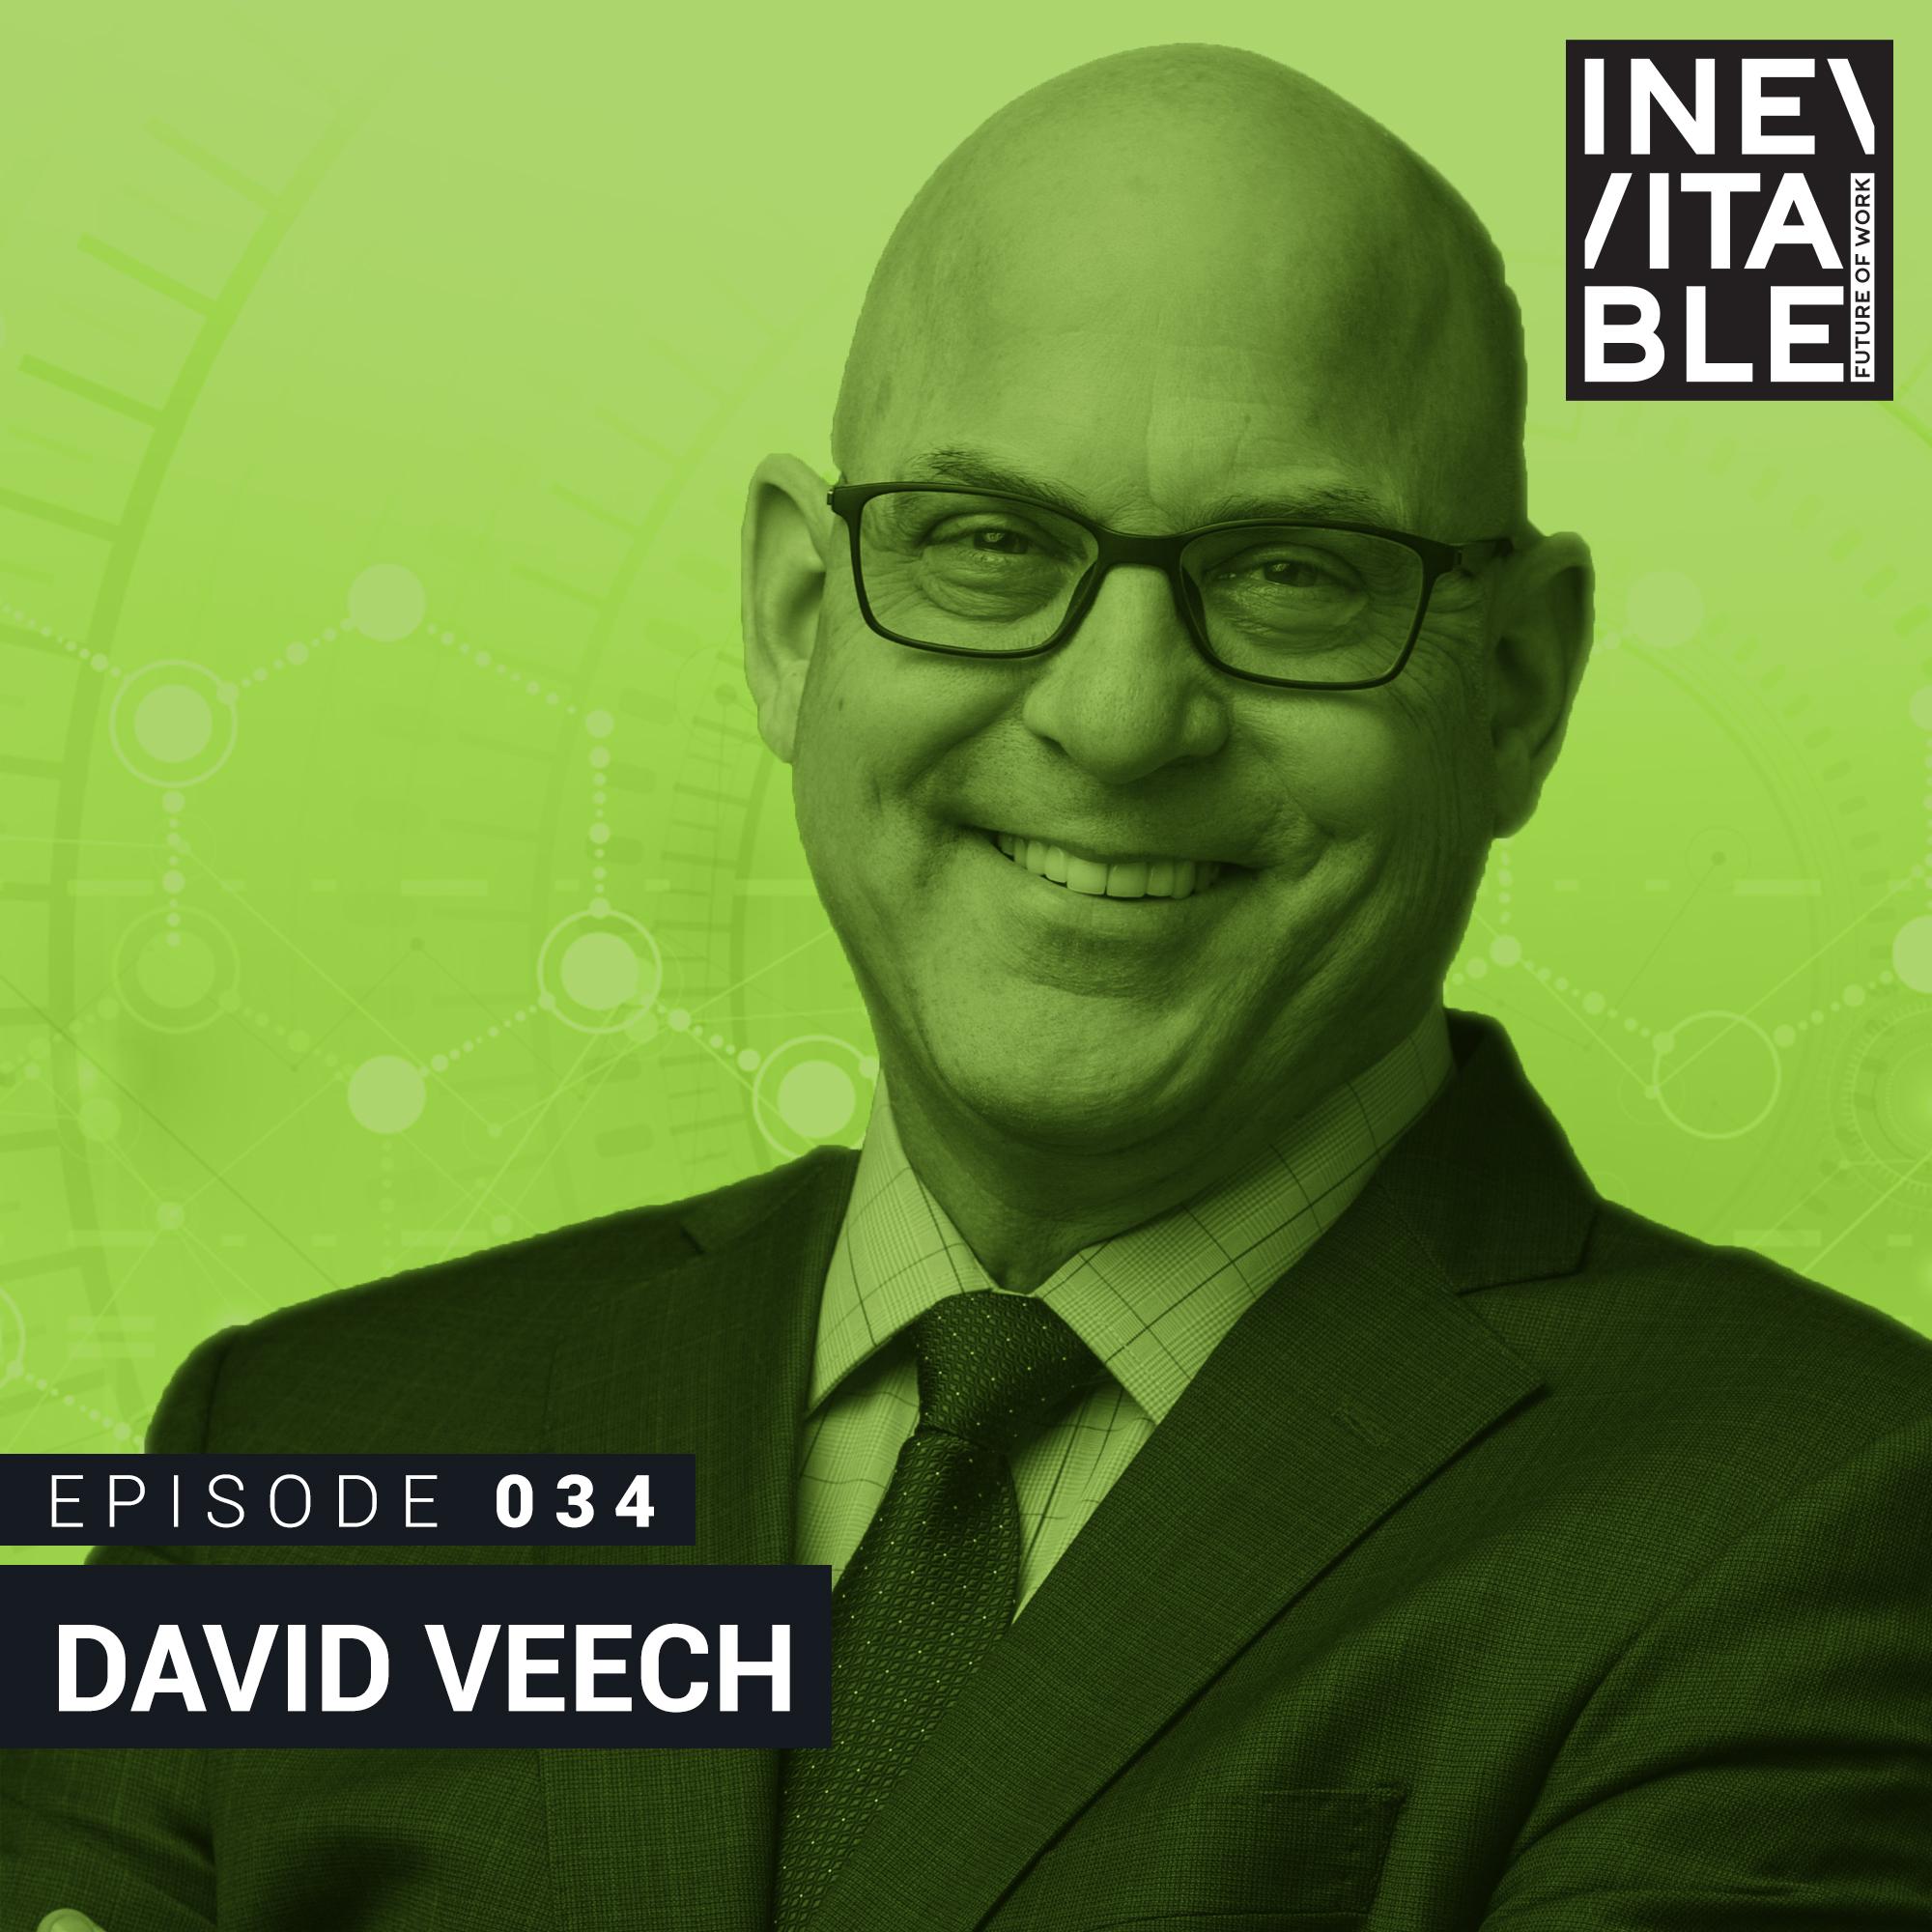 David Veech